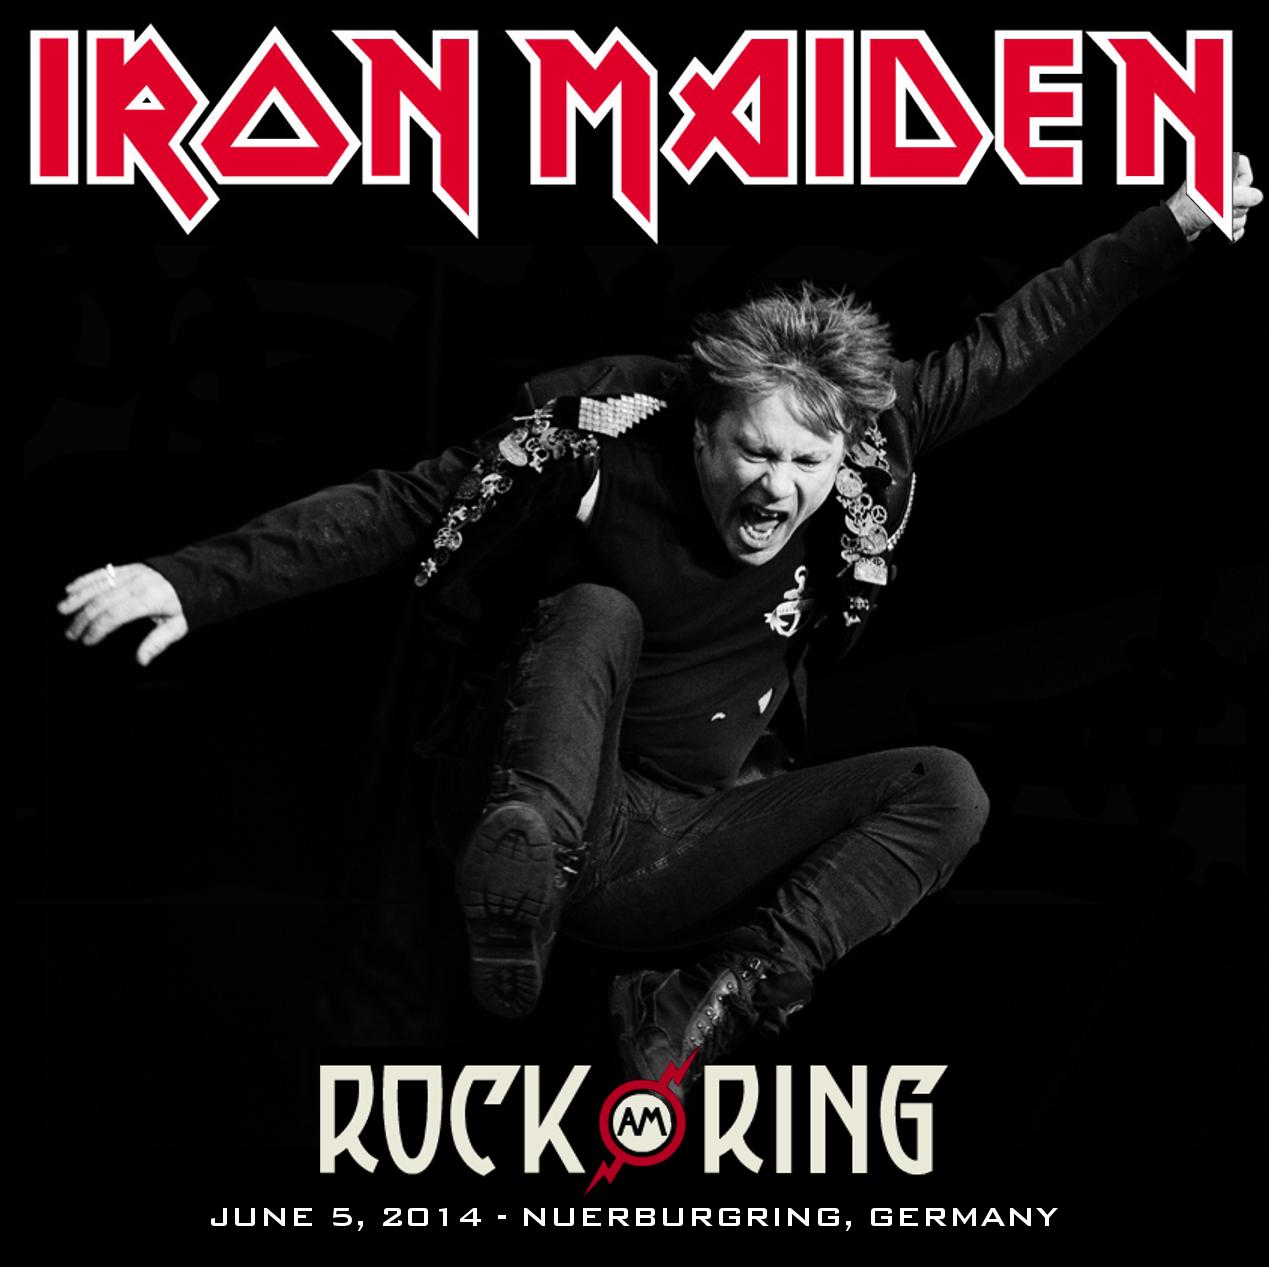 iron maiden rock am ring 2014 720p 1080p full torrent. Black Bedroom Furniture Sets. Home Design Ideas